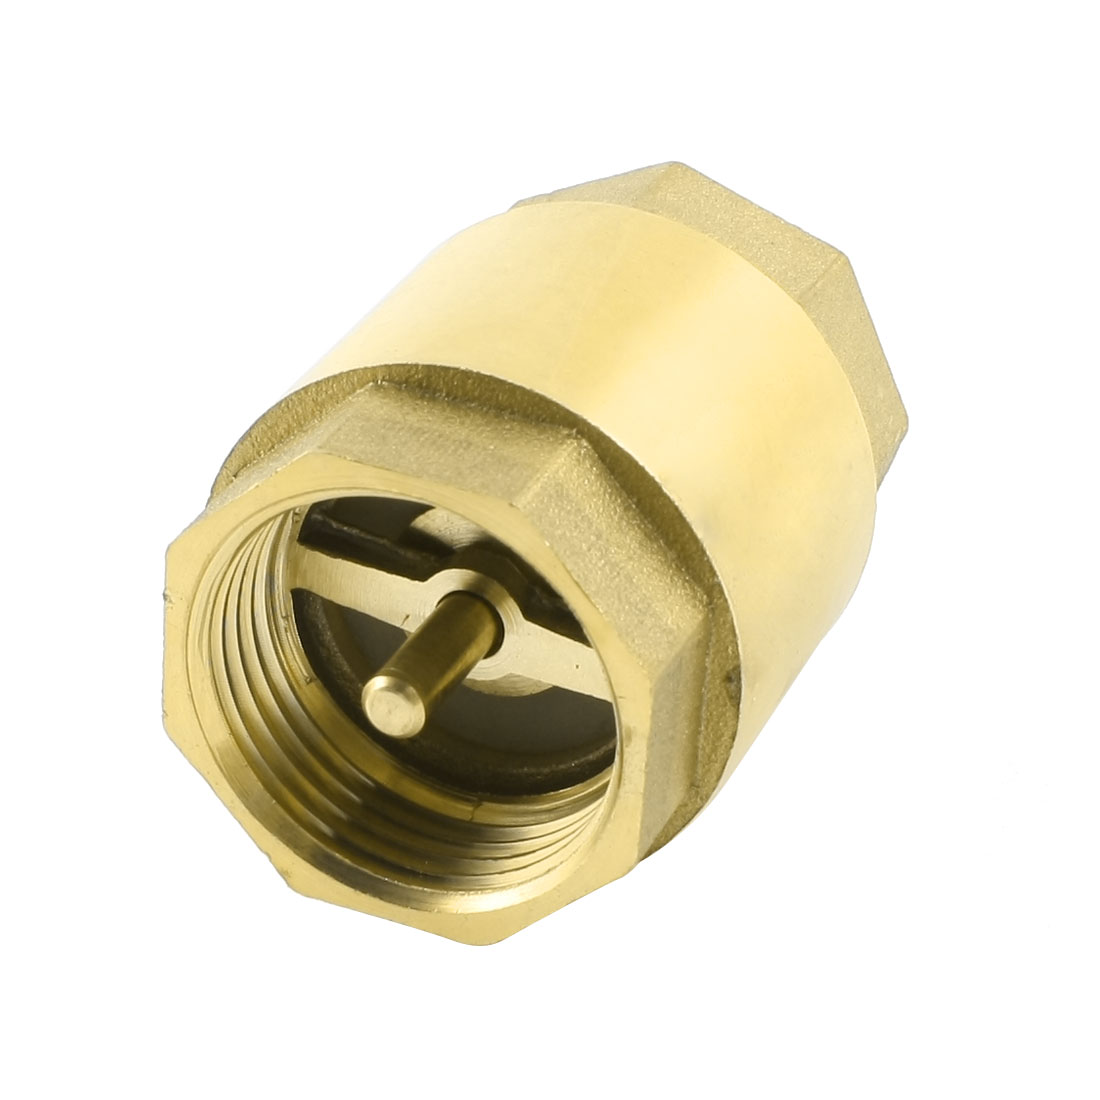 31mm 1PT Female Thread Gold Tone In Line Spring Check Valve